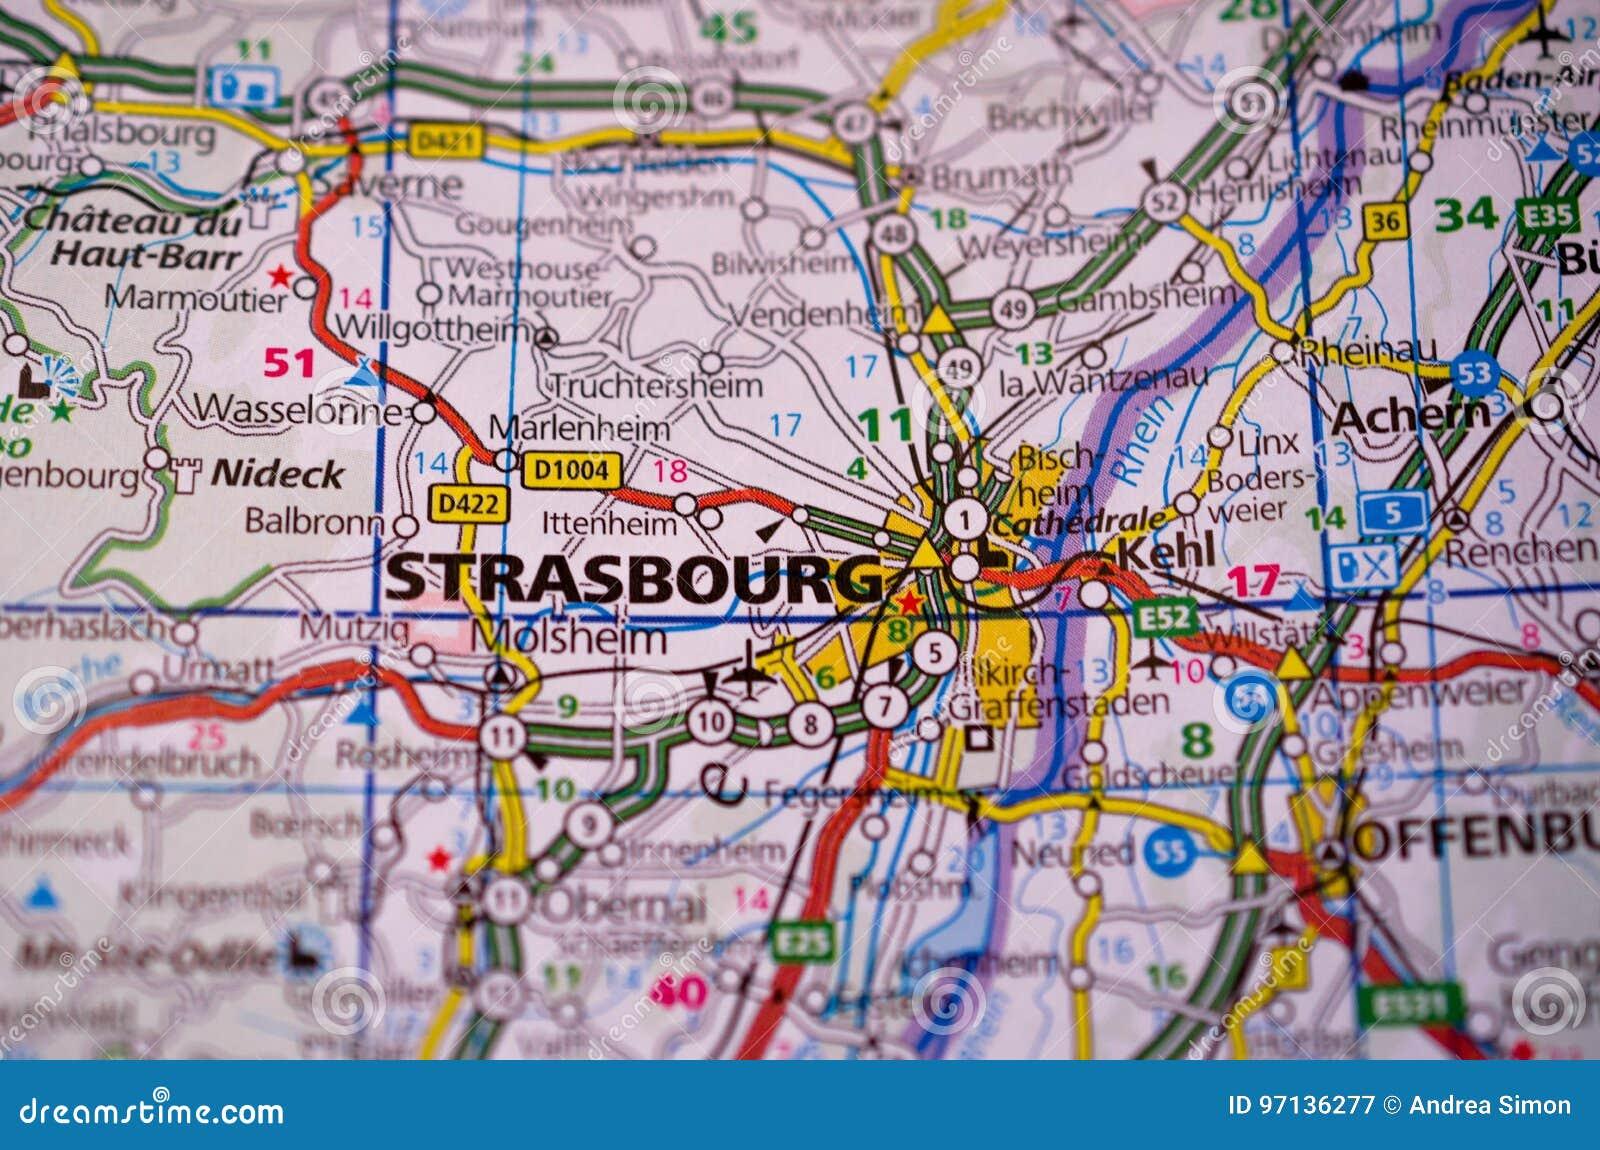 Strasbourg On Map Stock Image Image Of City Transport 97136277